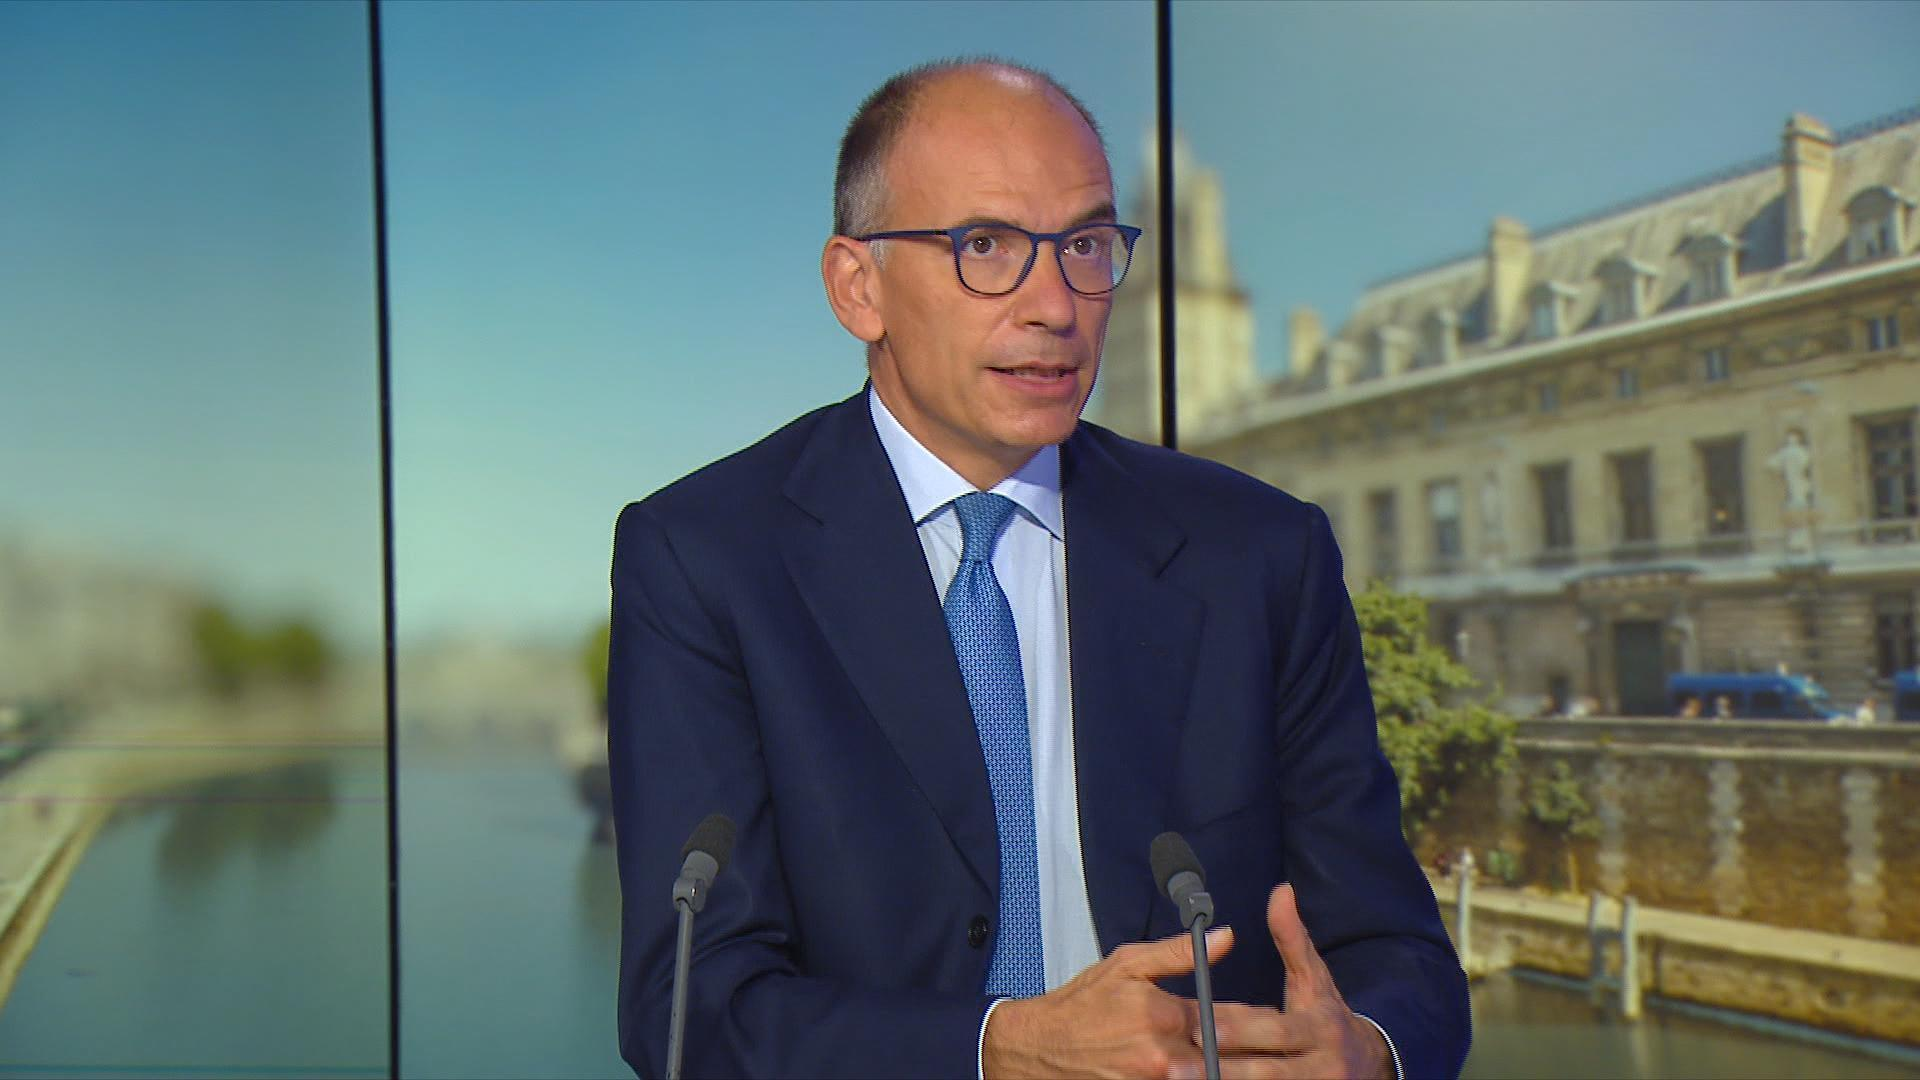 2020-09-12 13:10 ICI L'EUROPE